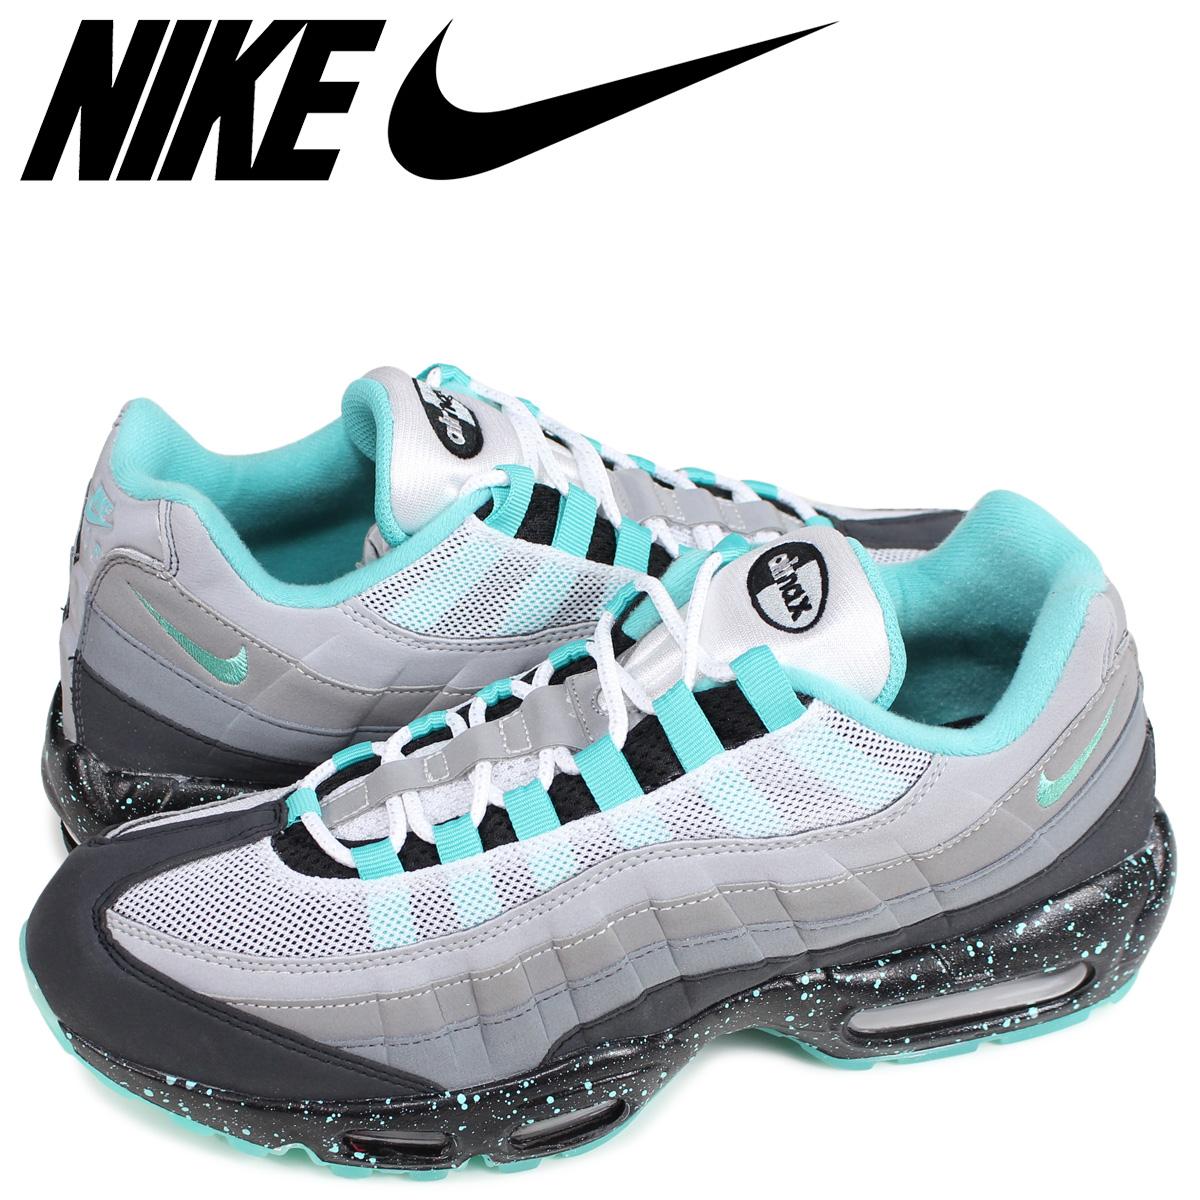 NIKE Kie Ney AMAX sneakers AIR MAX ZERO ID ATMOS SAFARI AA4630 991 men shoes yellow